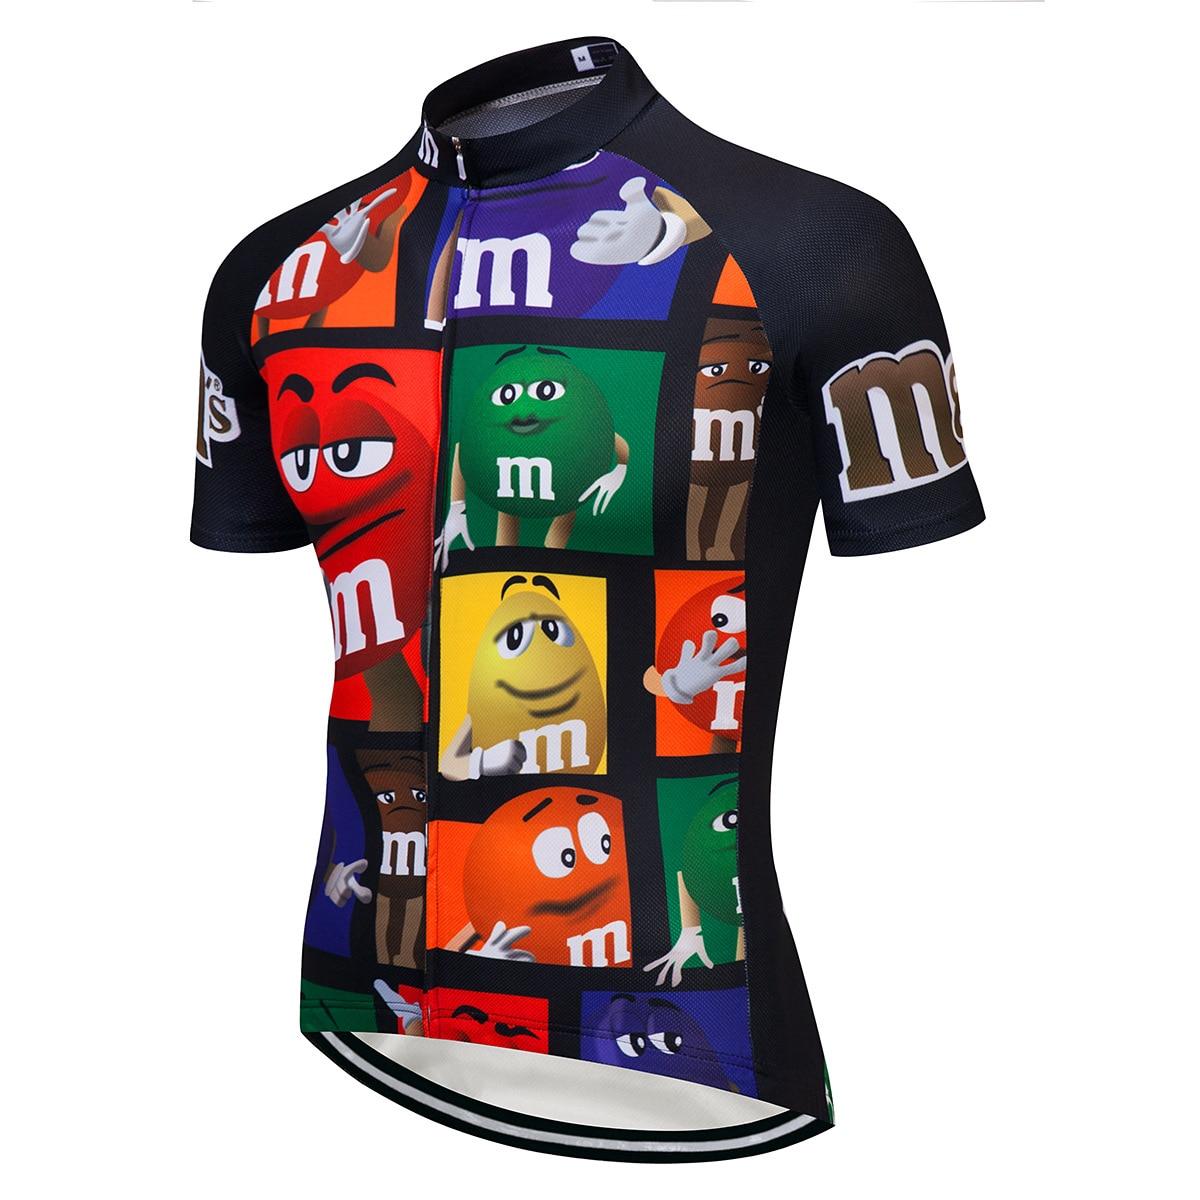 2020 transpirable bicicleta de montaña ropa de carreras DH MTB camiseta de dibujos animados ciclismo Jersey Road Team bicicleta Wear camisetas hombres